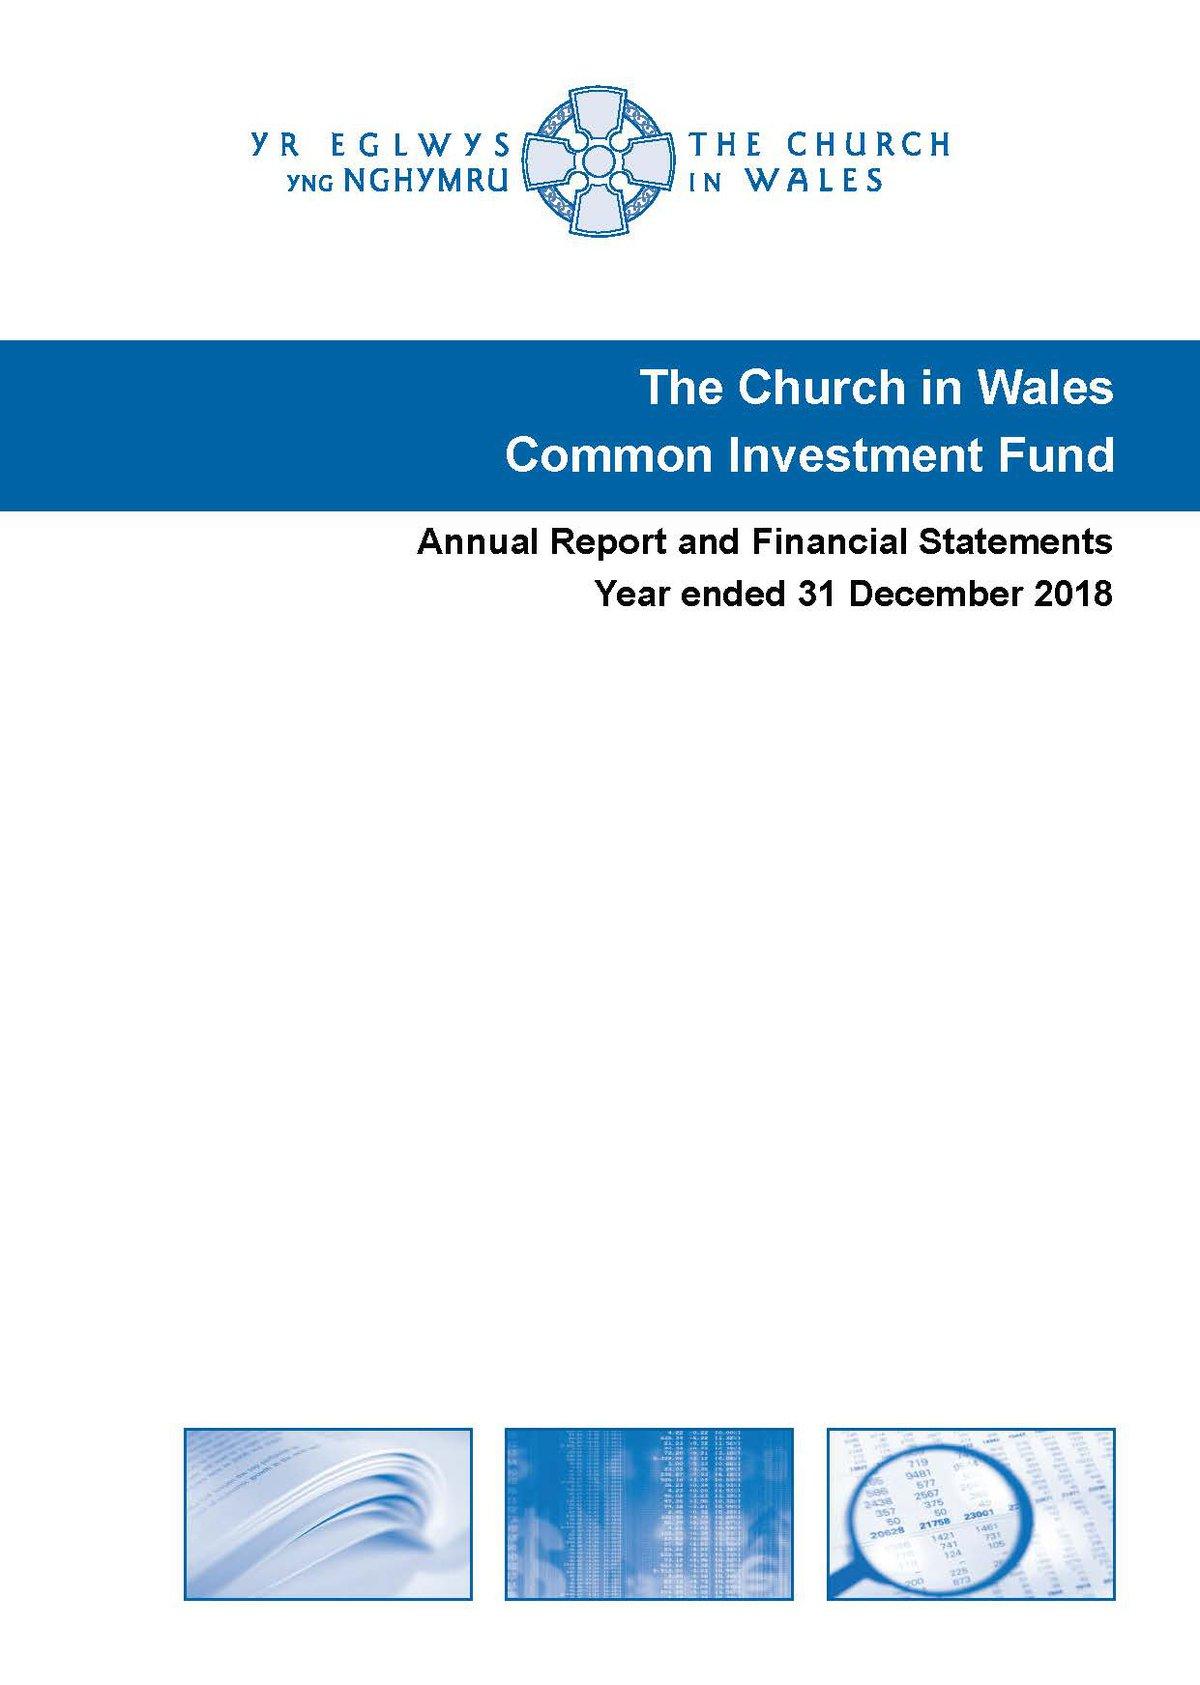 Common Investment Fund 2018